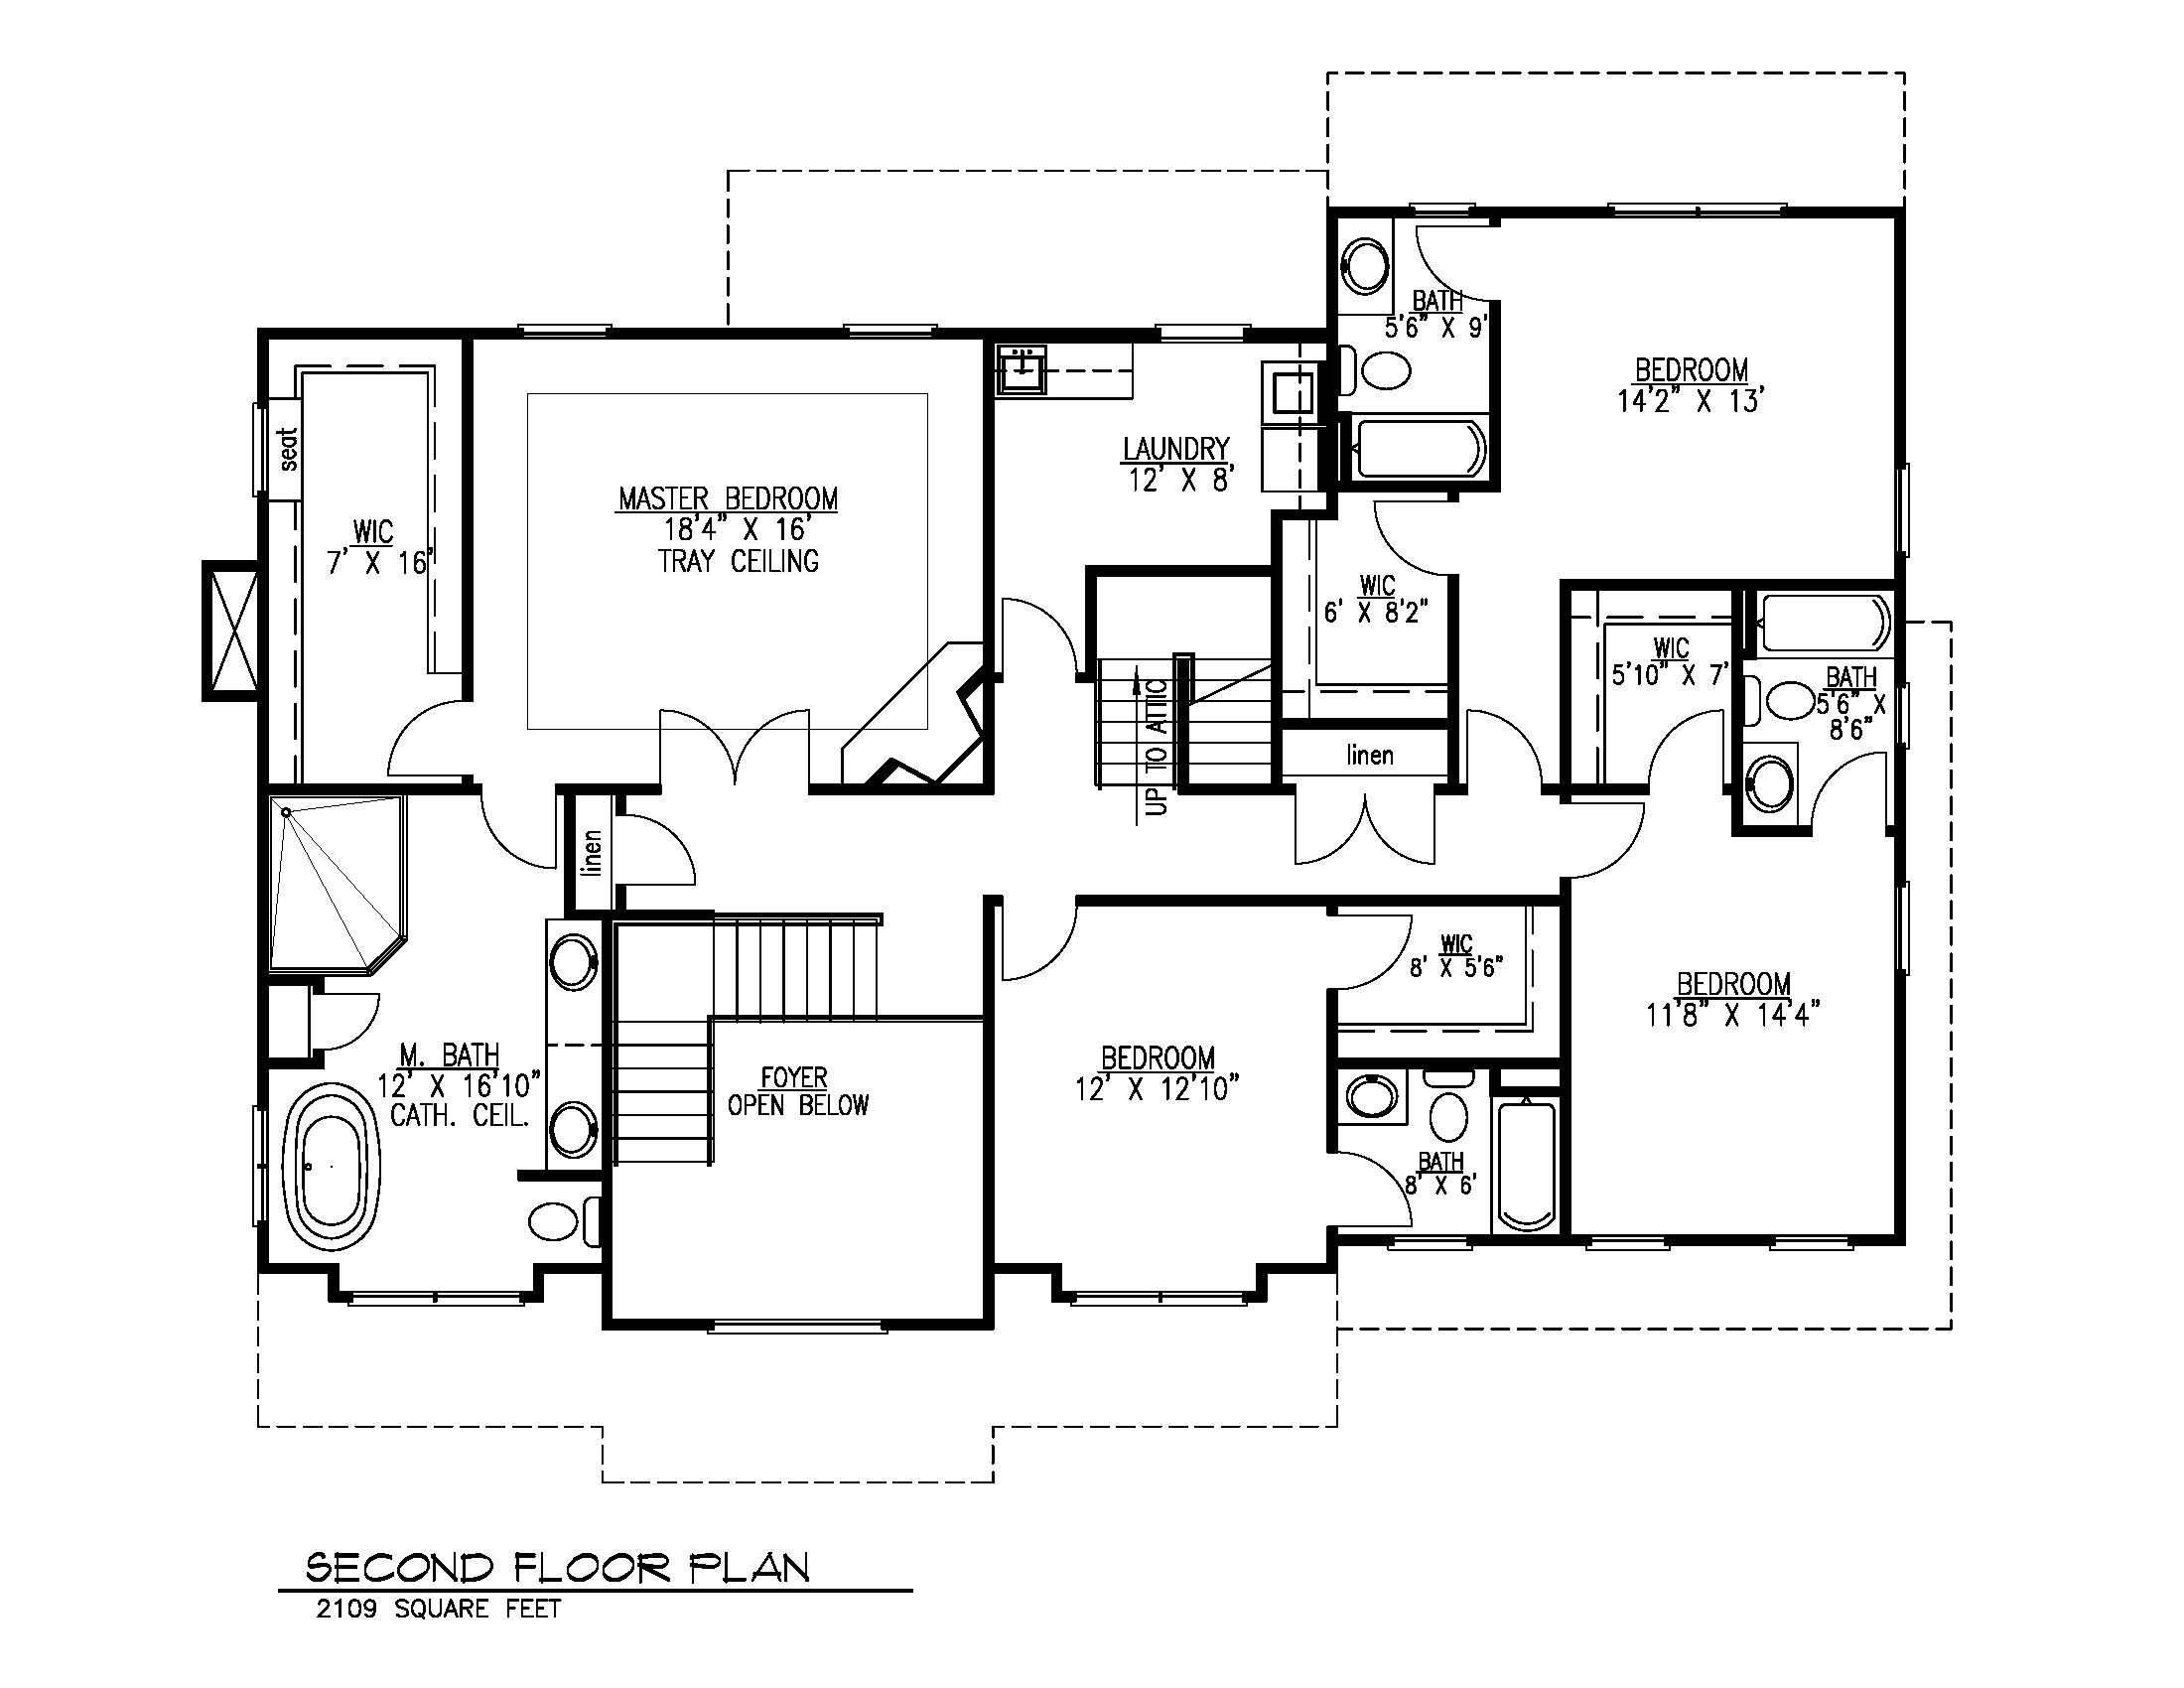 407 Quantuck Second Floor Plan B&W